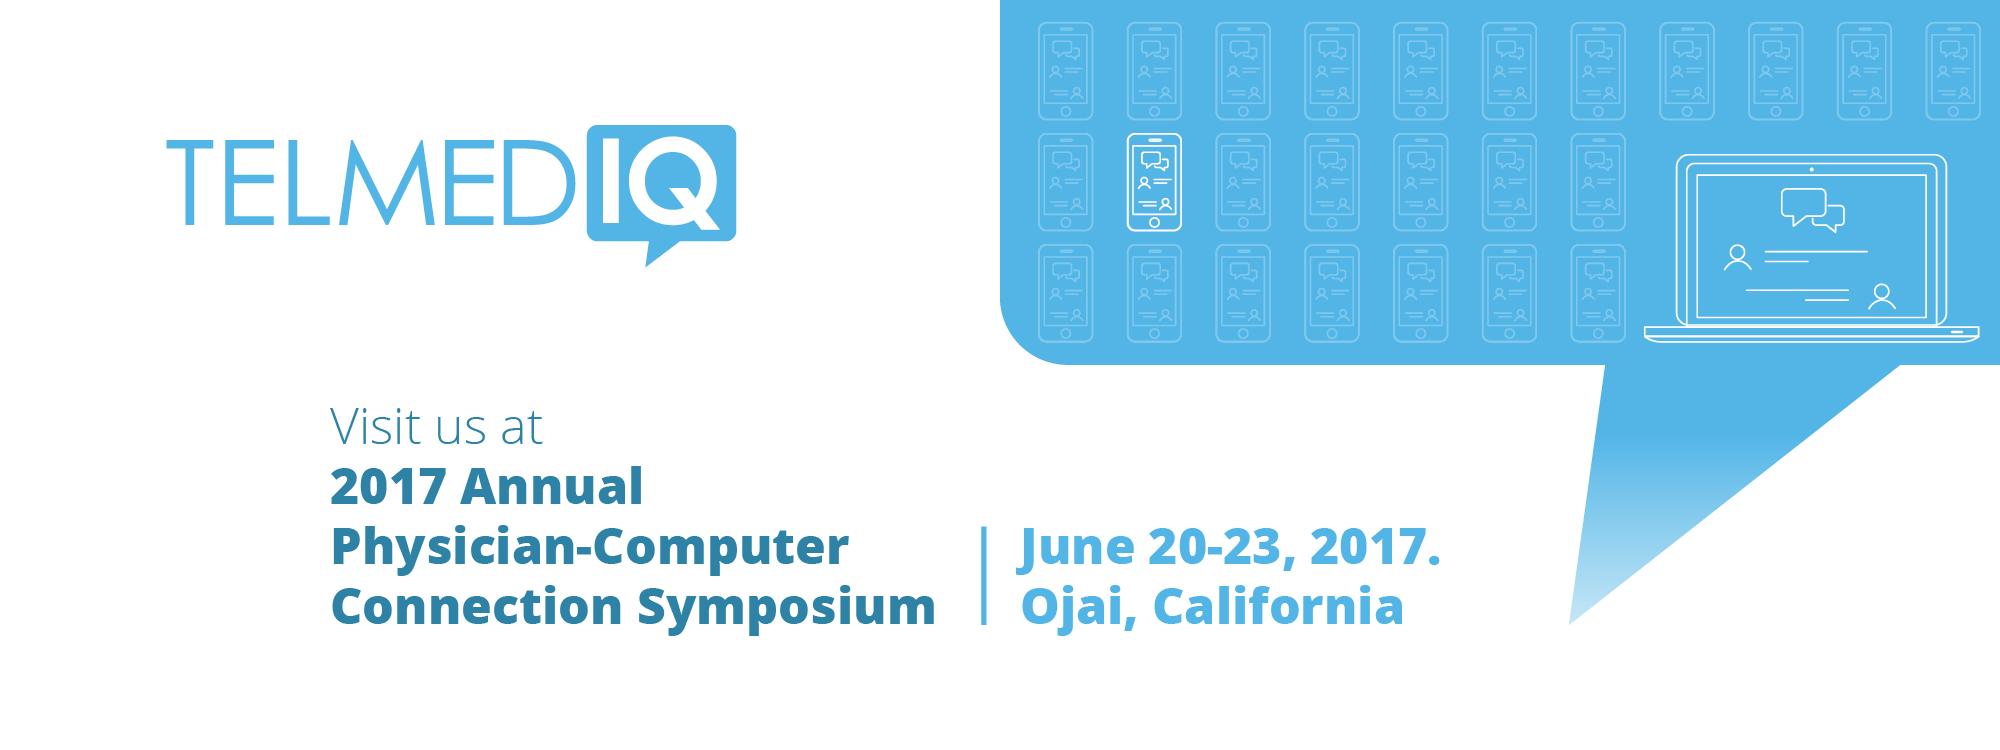 AMDIS Symposium 2017